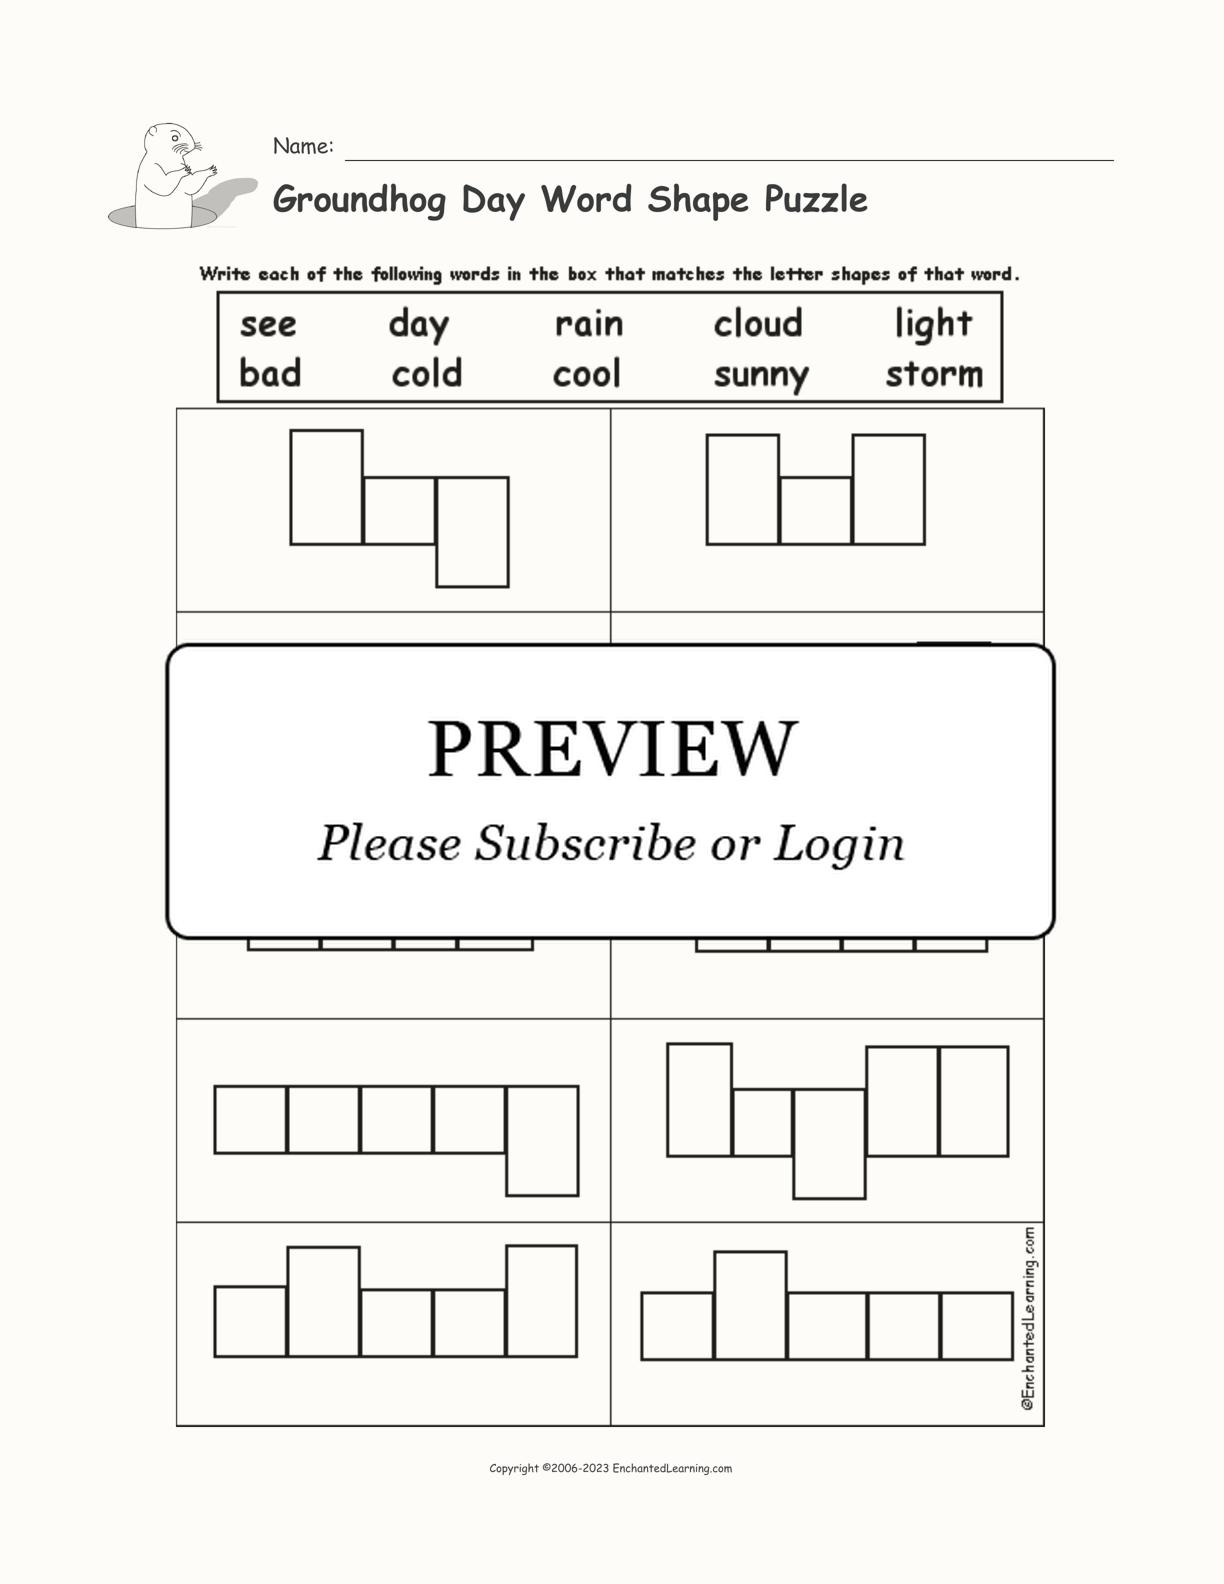 Groundhog Day Word Shape Puzzle